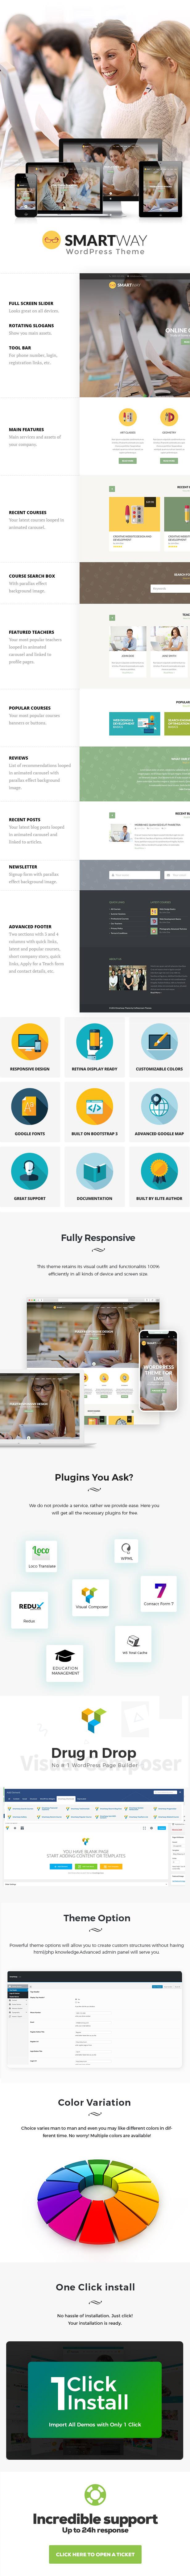 Smartway - Learning & Courses WordPress Theme - 1